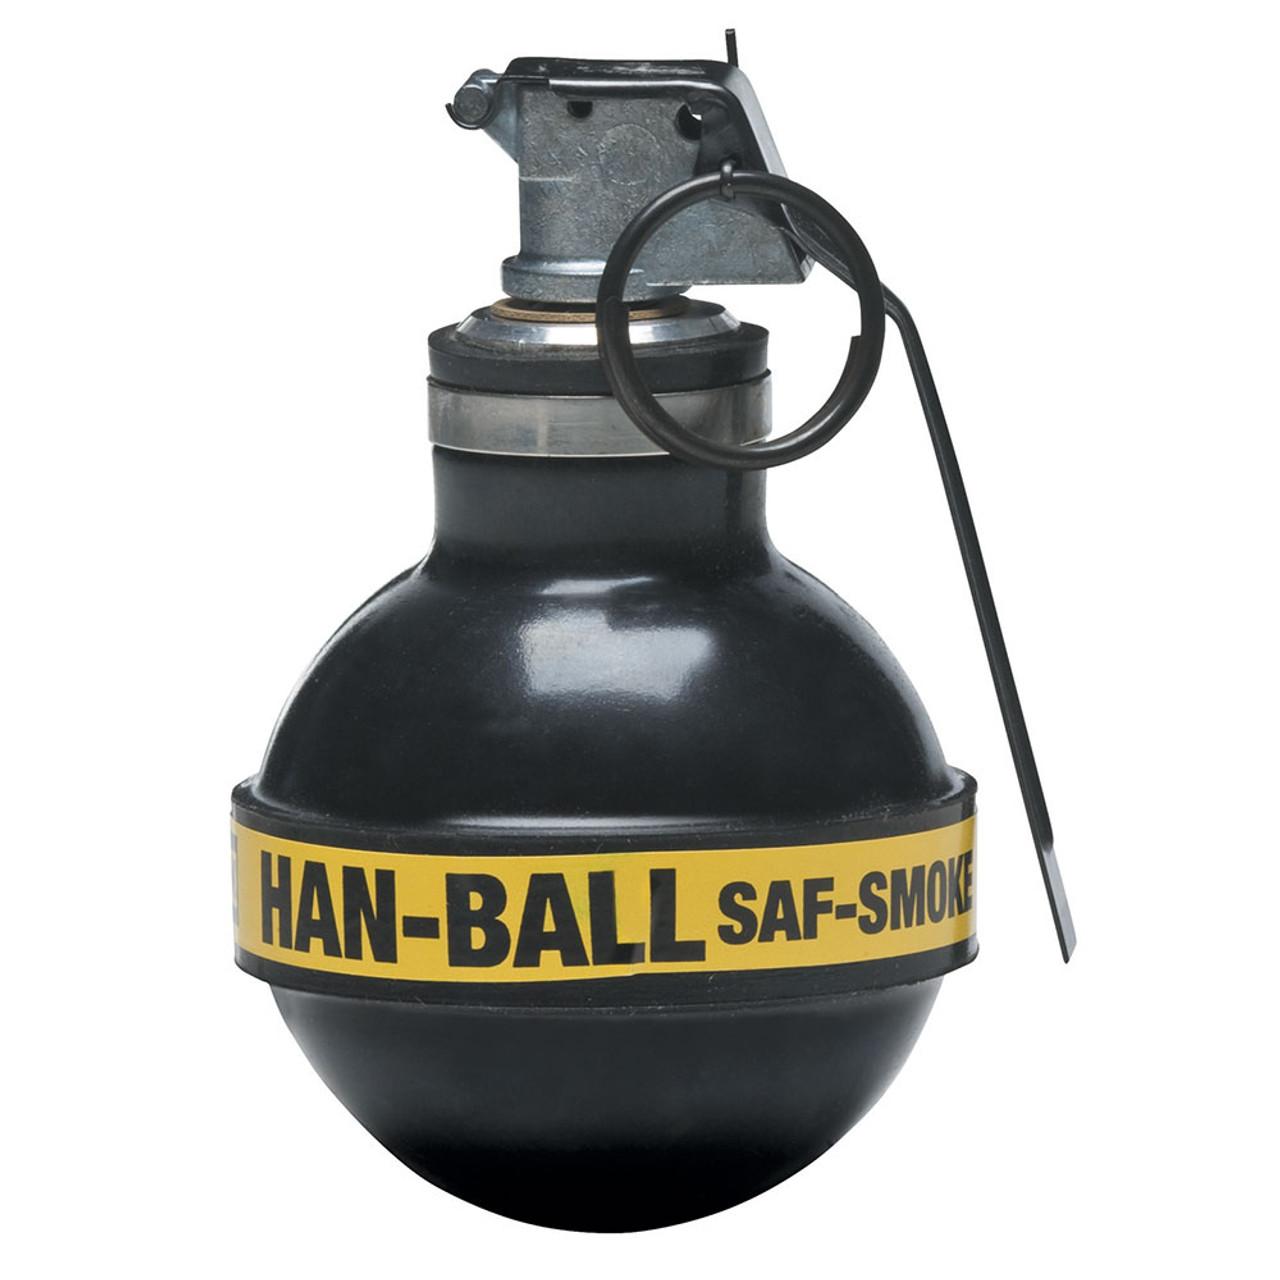 Def Tec Saf Smoke Rubber Ball Grenade Atlantic Tactical Inc